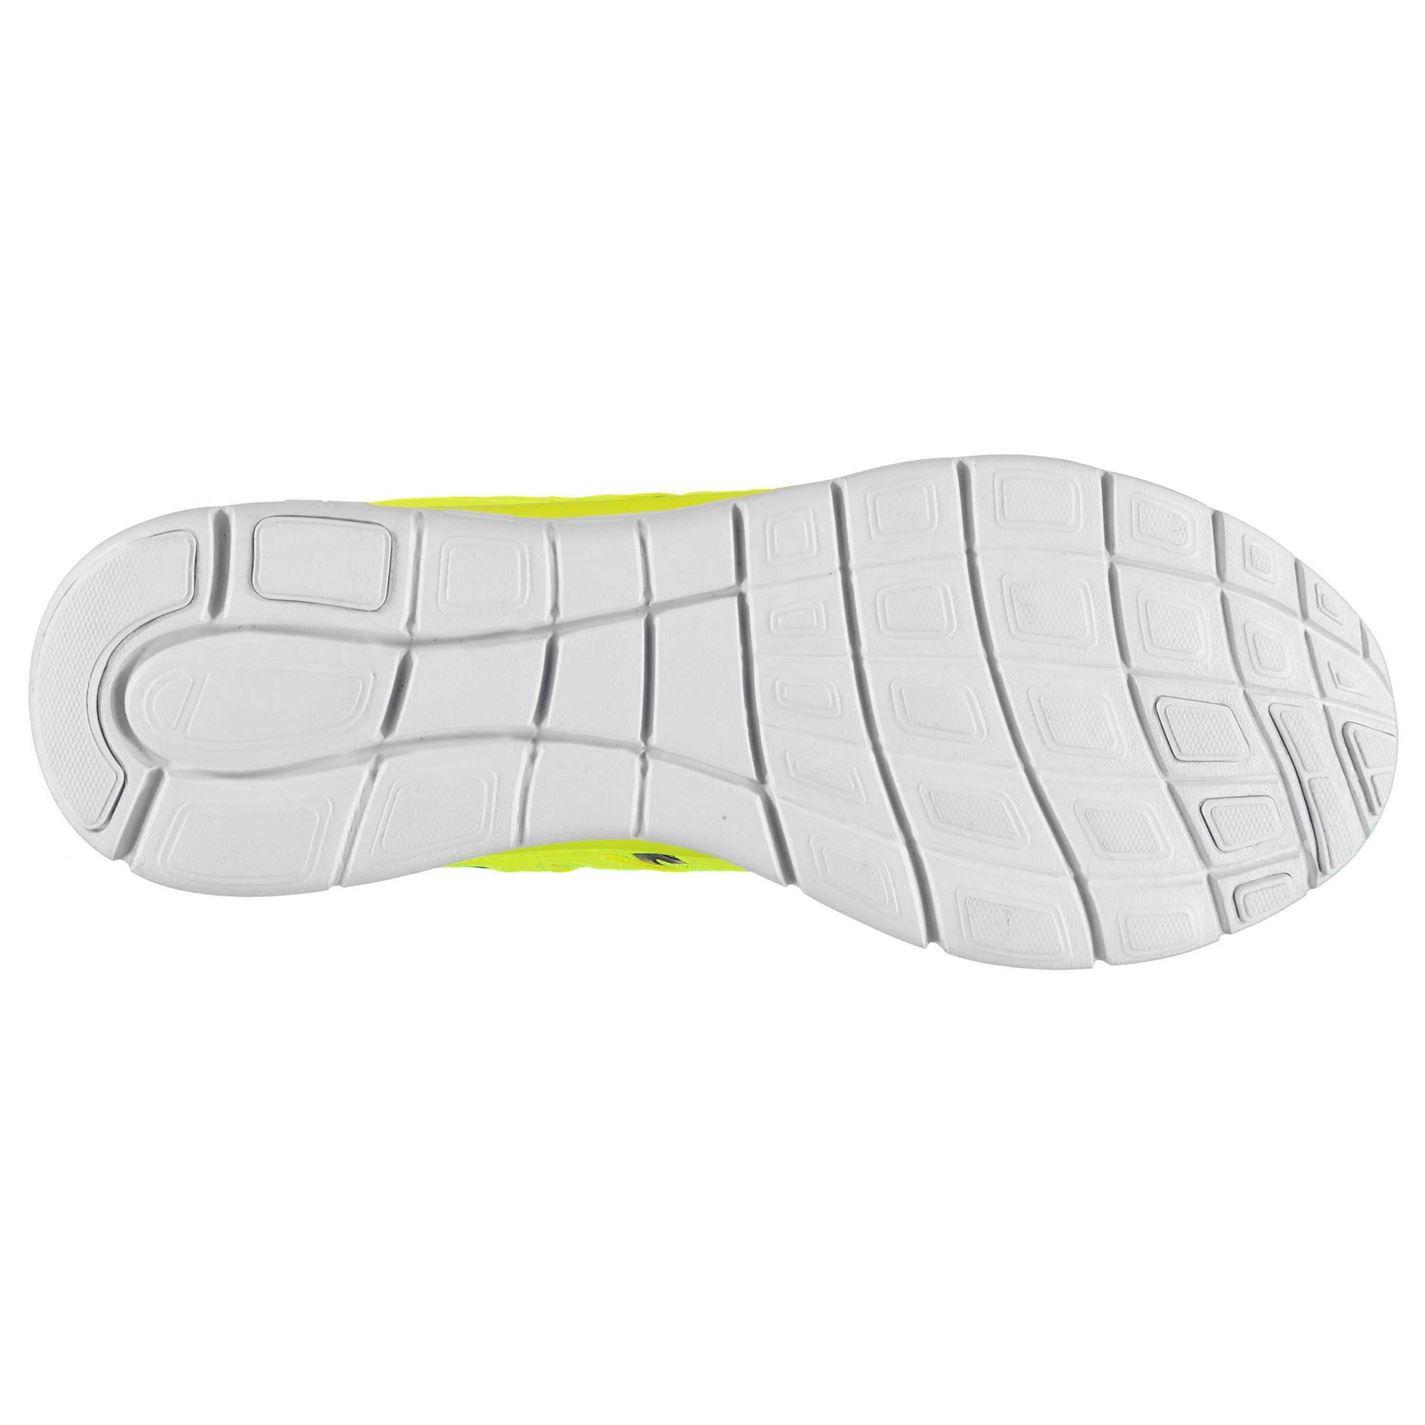 Karrimor-Mens-Duma-Trainers-Lace-Up-Sports-Running-Cross-Training-Shoes thumbnail 53